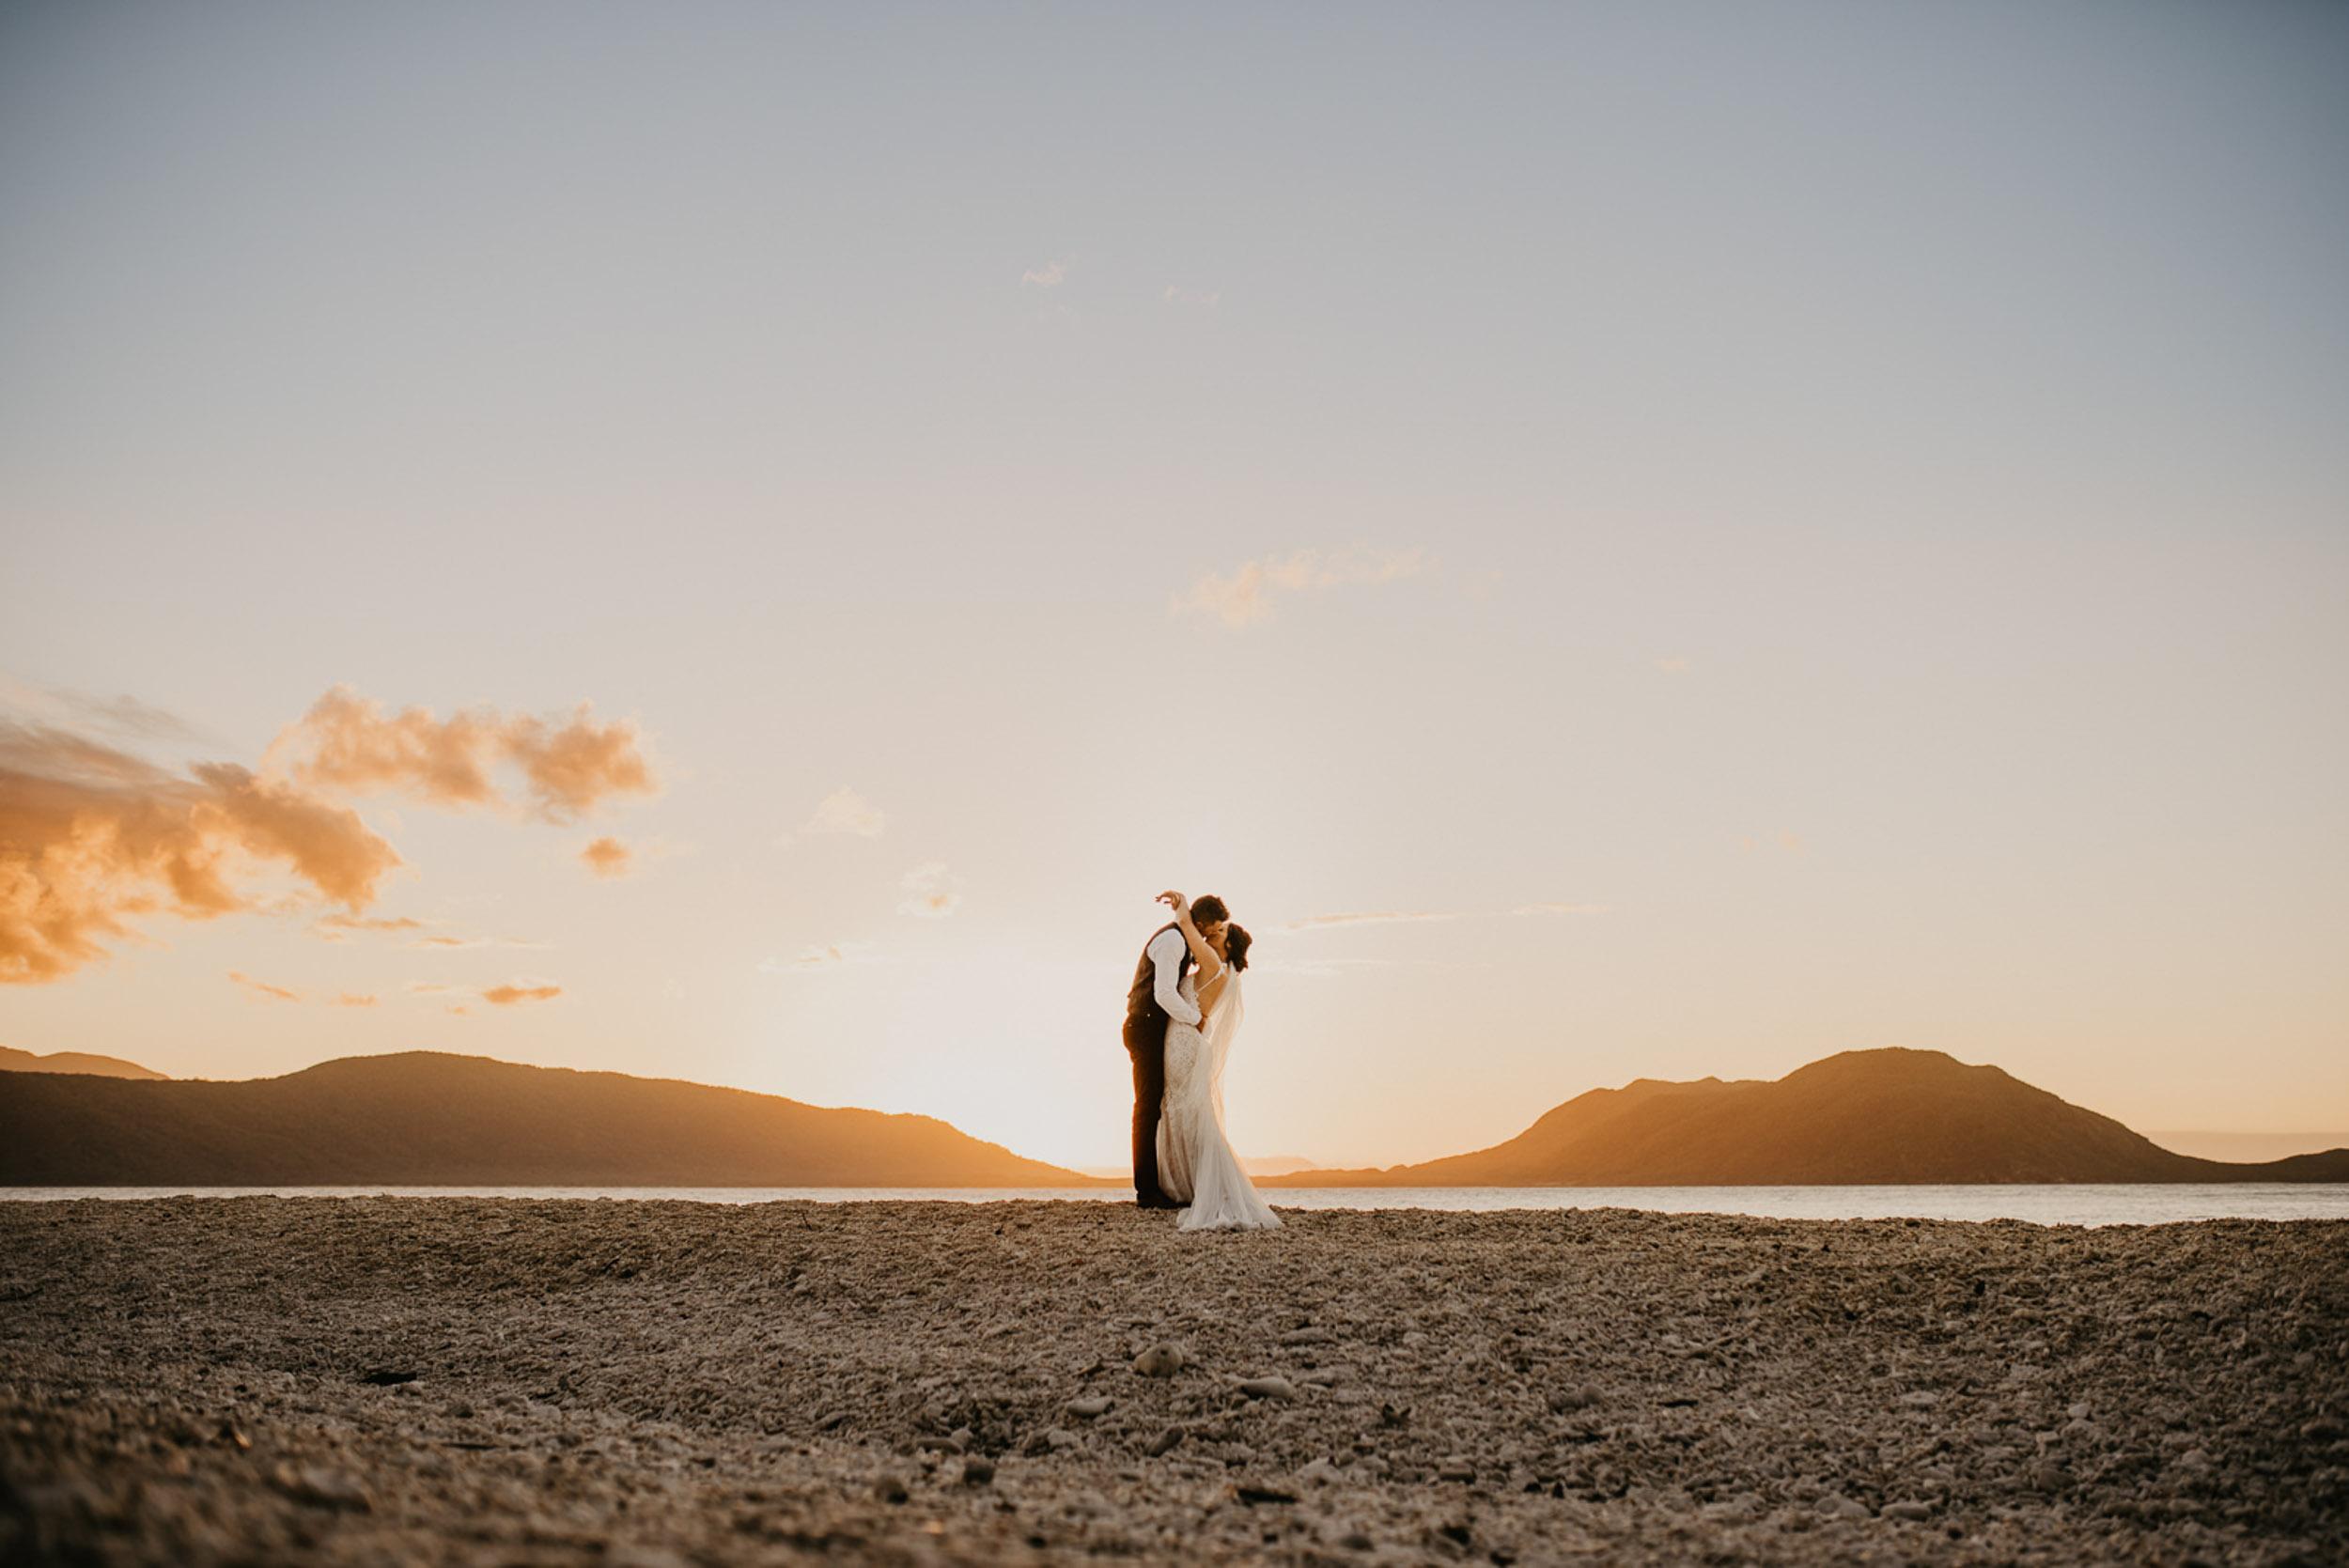 The Raw Photographer - Cairns Wedding Photographer - Fitzroy Island - Destination Wedding - Bride Dress - Groom Portrait - Queensland-43.jpg